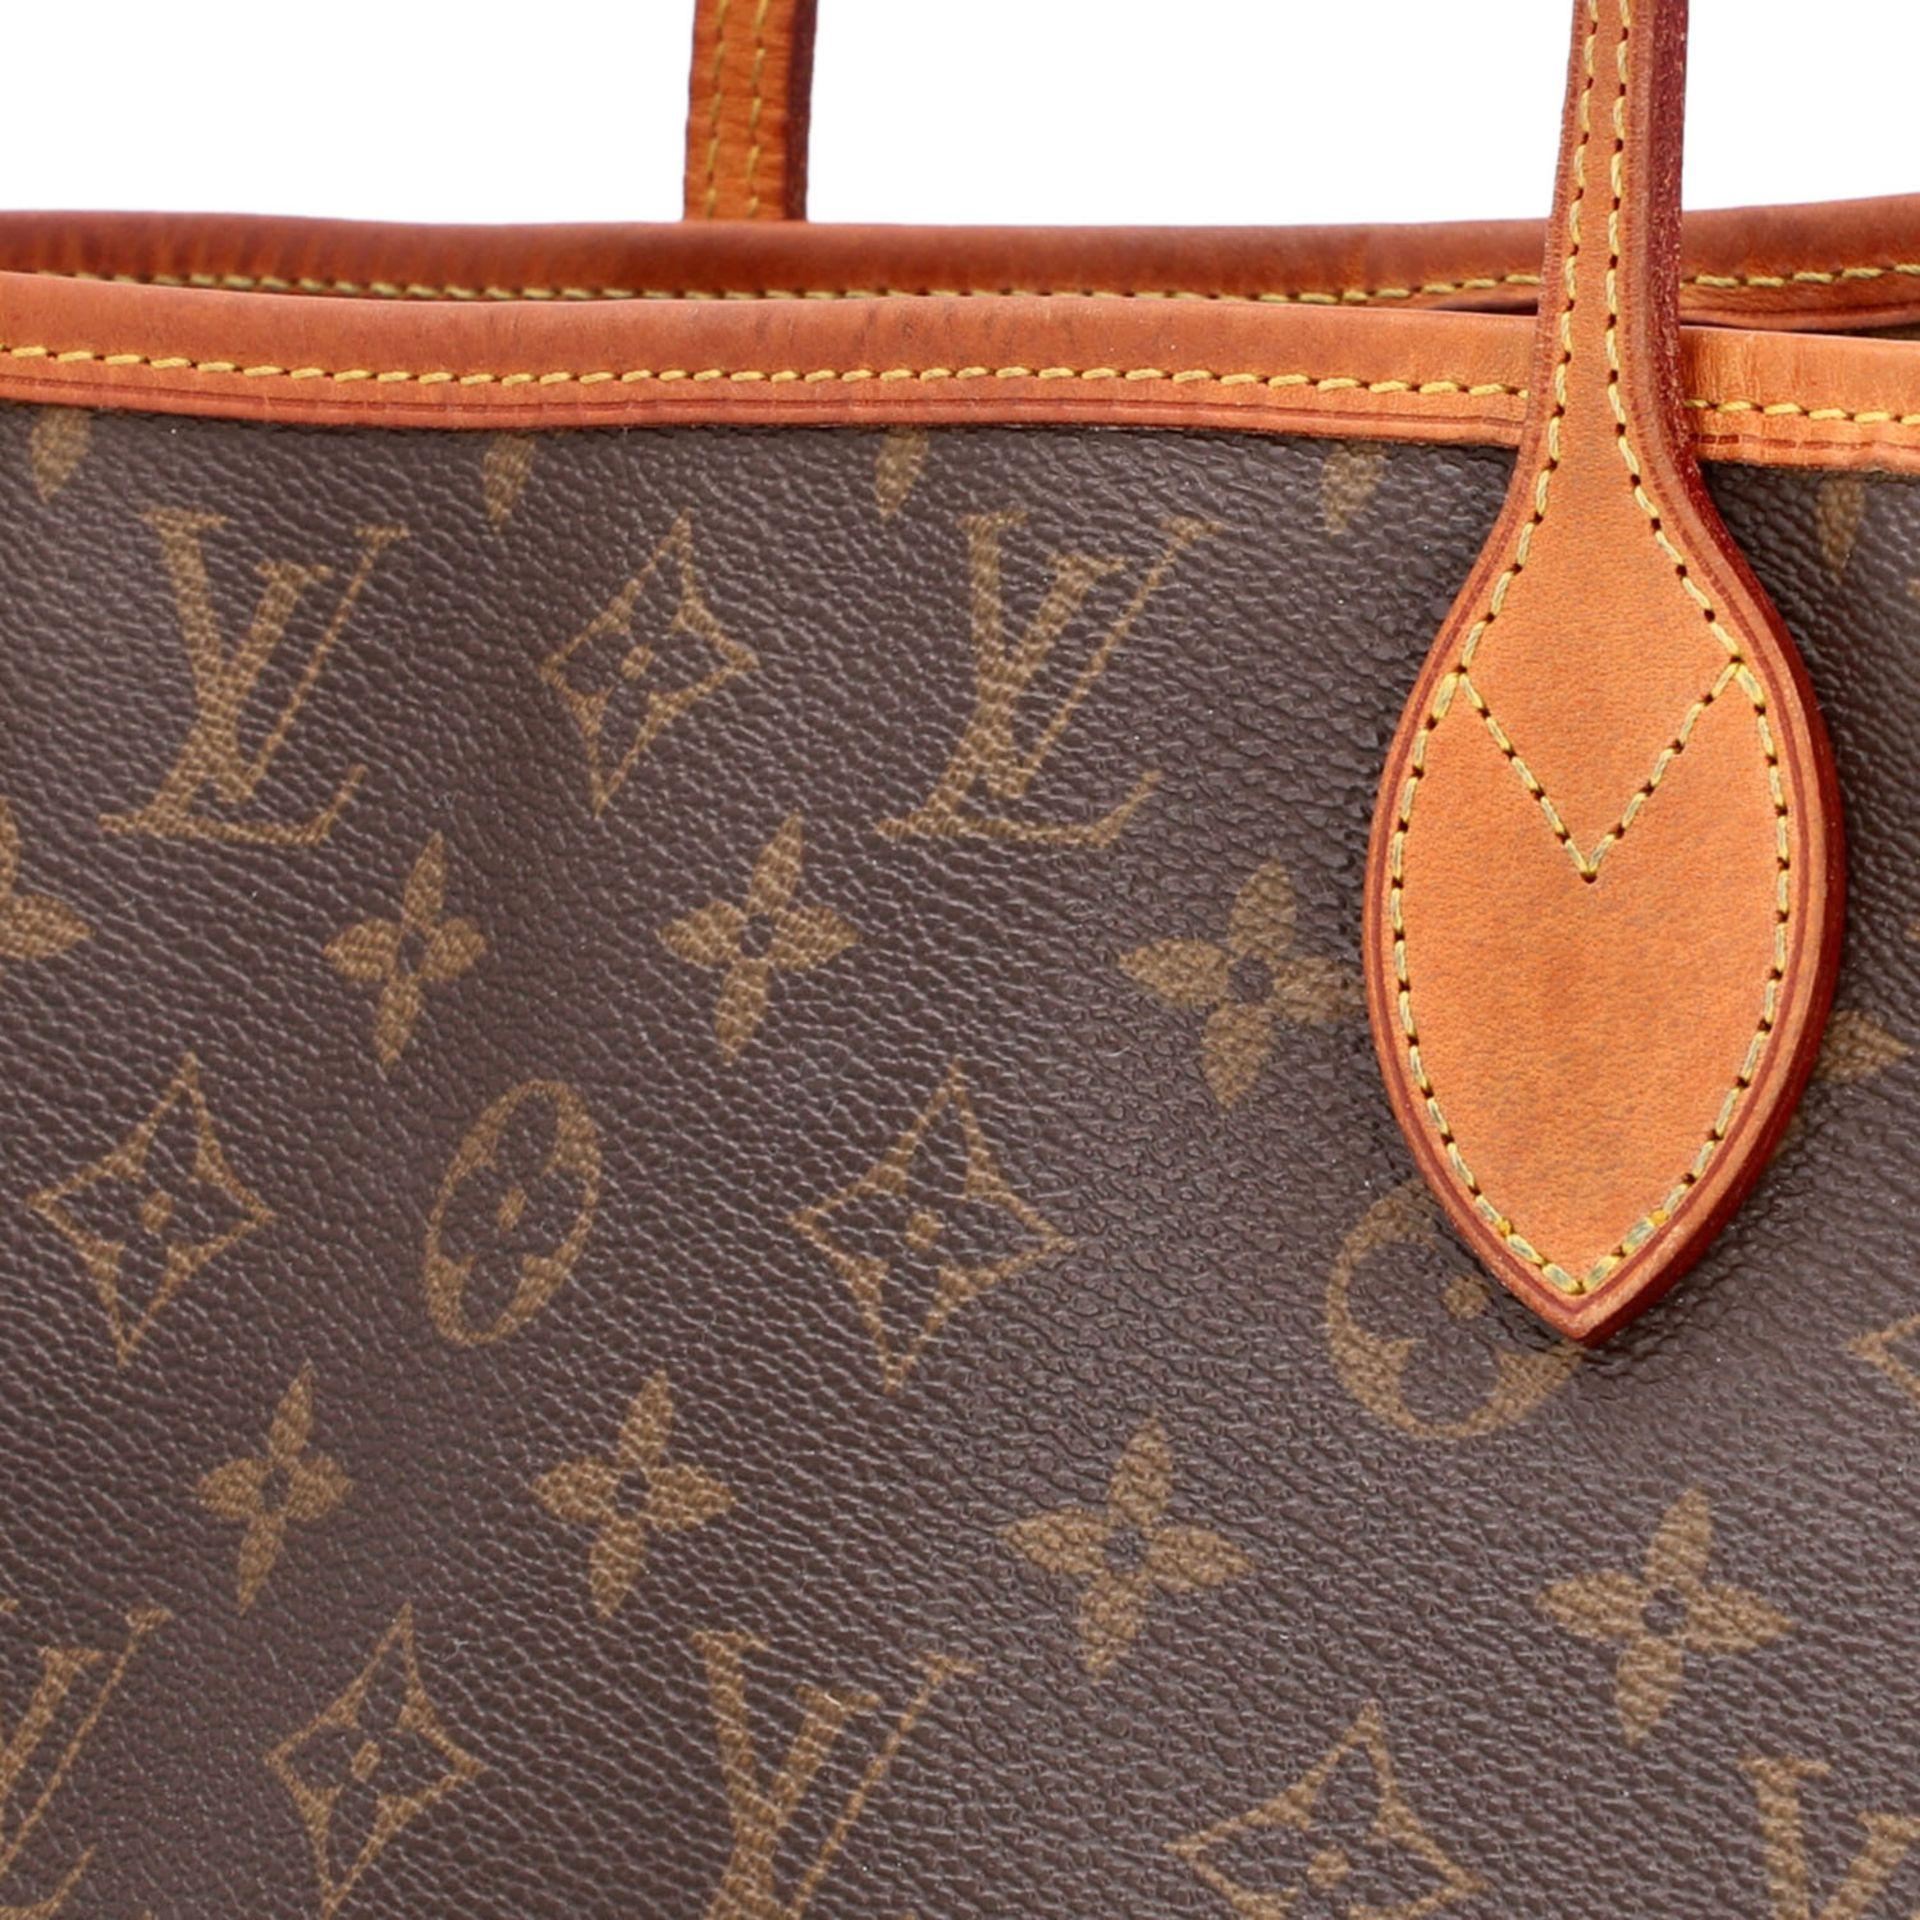 "LOUIS VUITTON Shopper ""NEVERFULL MM"", Koll.: 2011, akt. NP.: 1.150,-€. Monogram Canv - Image 7 of 8"